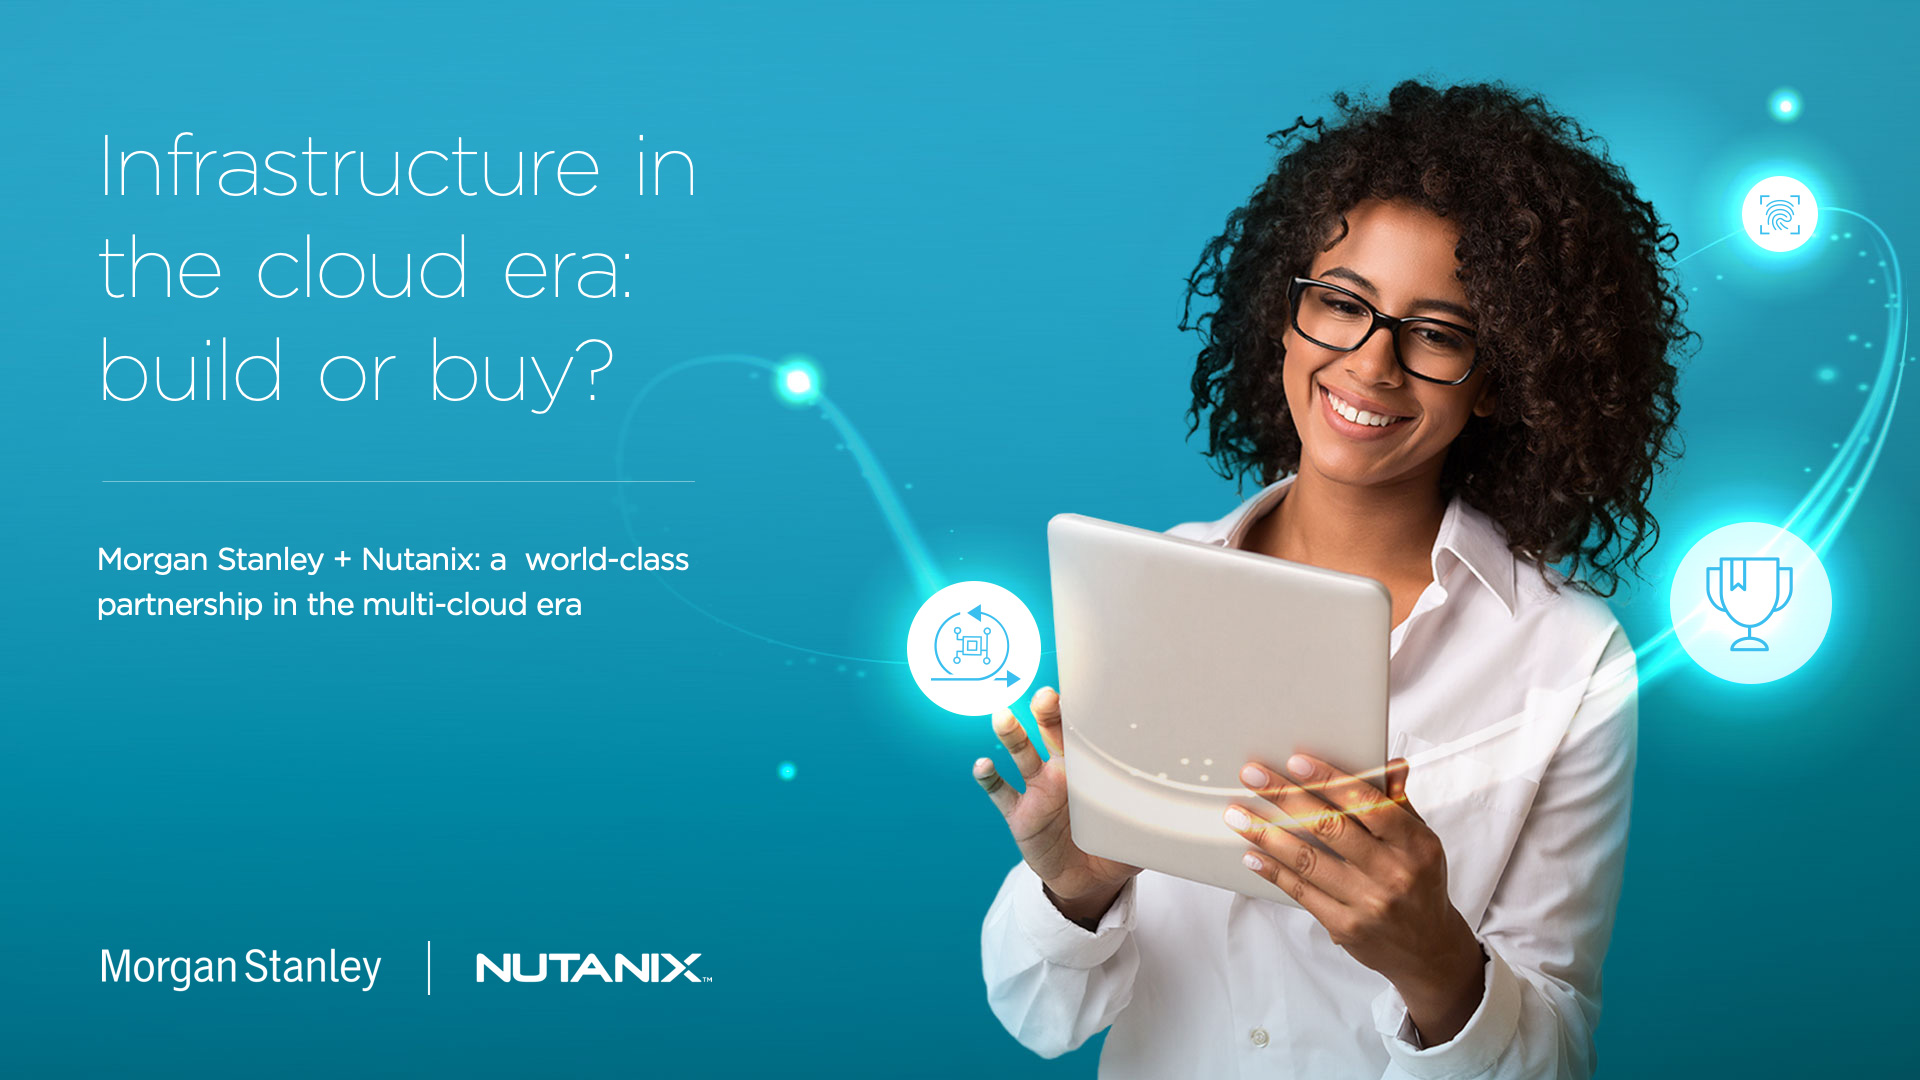 02078_Nutanix_Morgan_Stanley-Presentation_v1.6-1